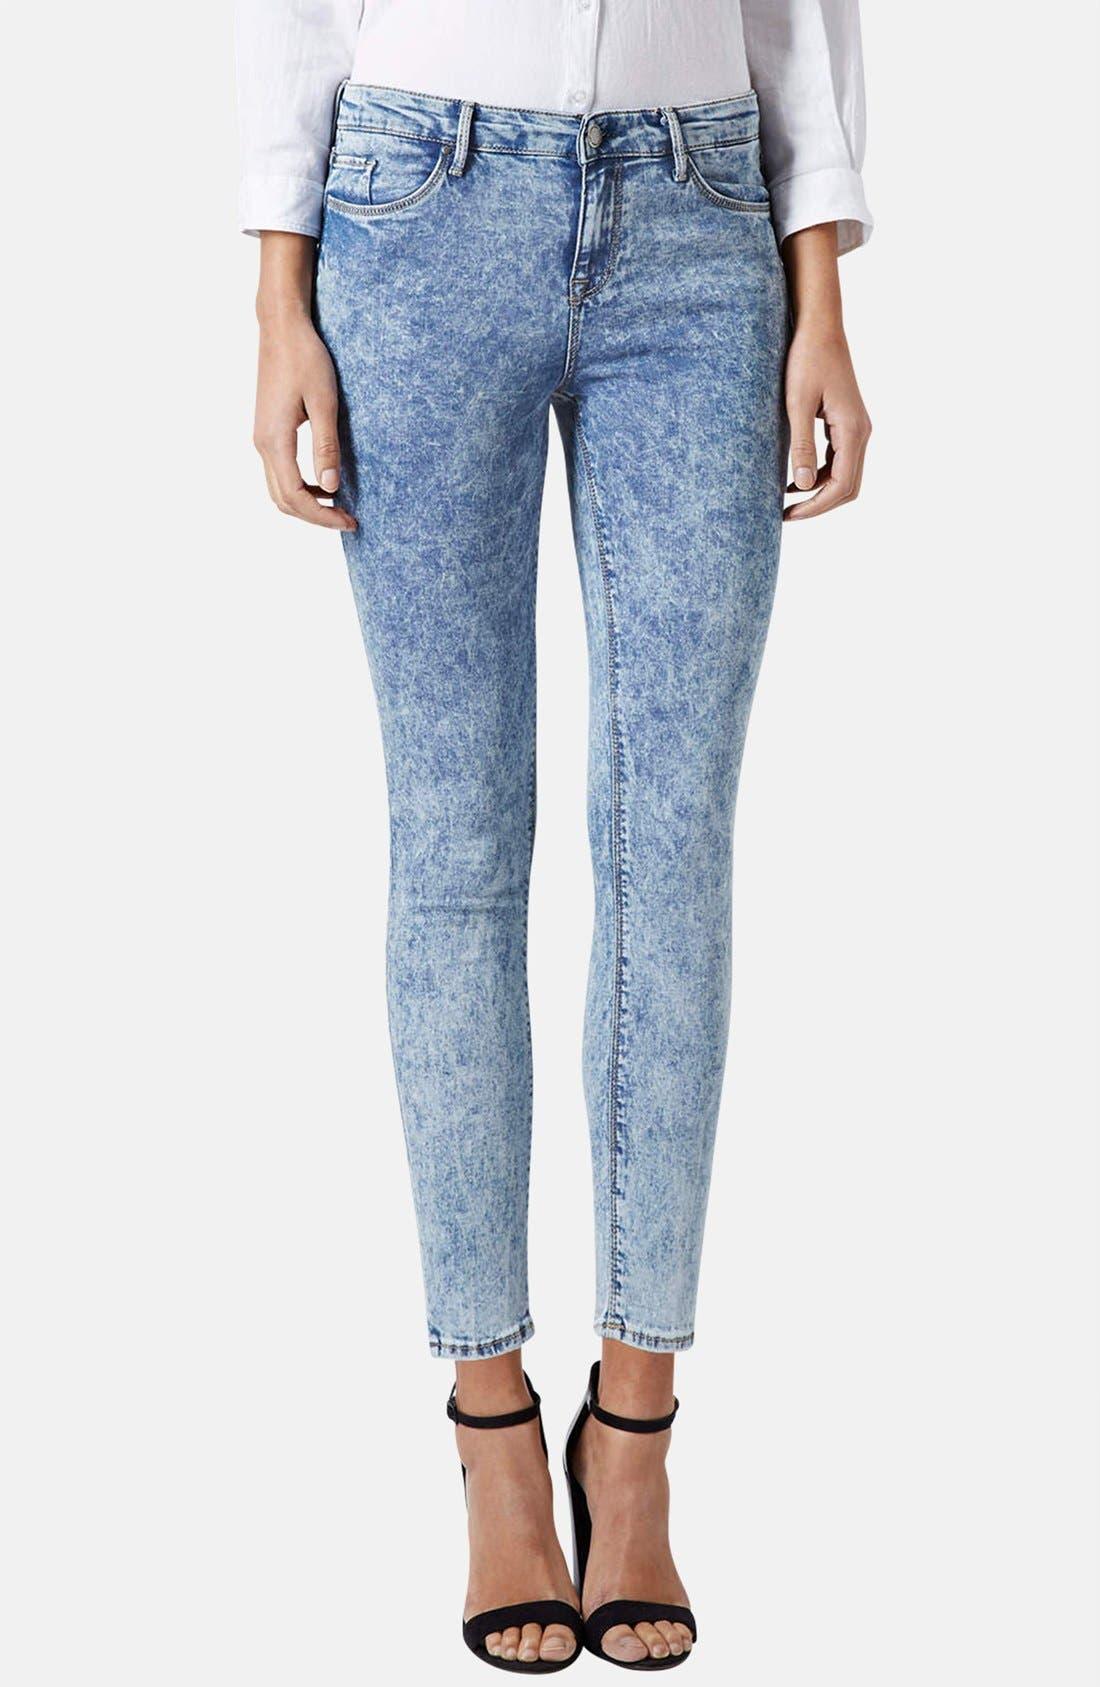 Alternate Image 1 Selected - Topshop Moto 'Leigh' Acid Wash Skinny Jeans (Light Denim) (Petite)